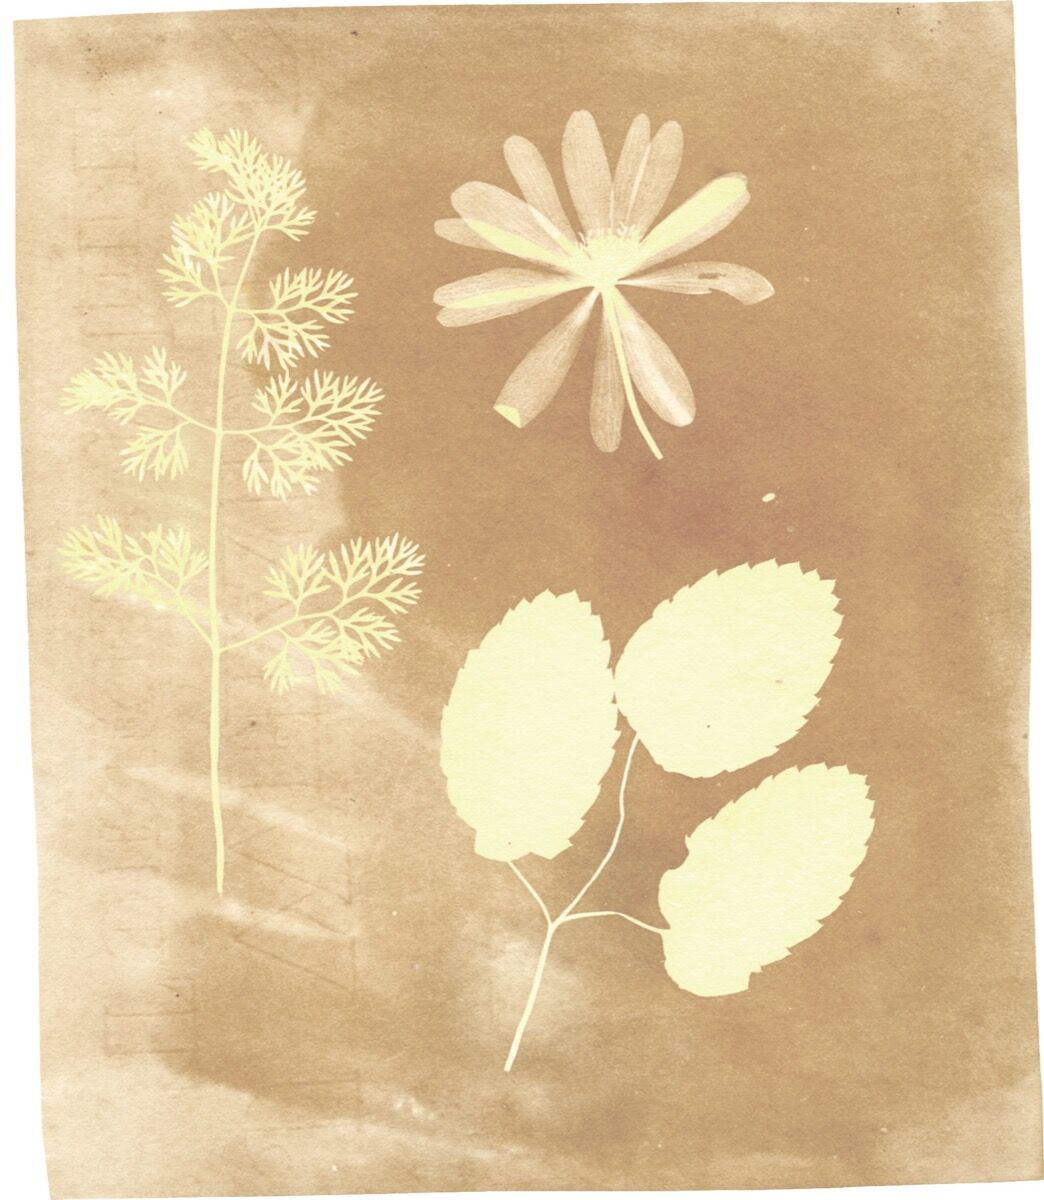 Original print by William Henry Fox Talbot. Courtesy of National Media Museum.